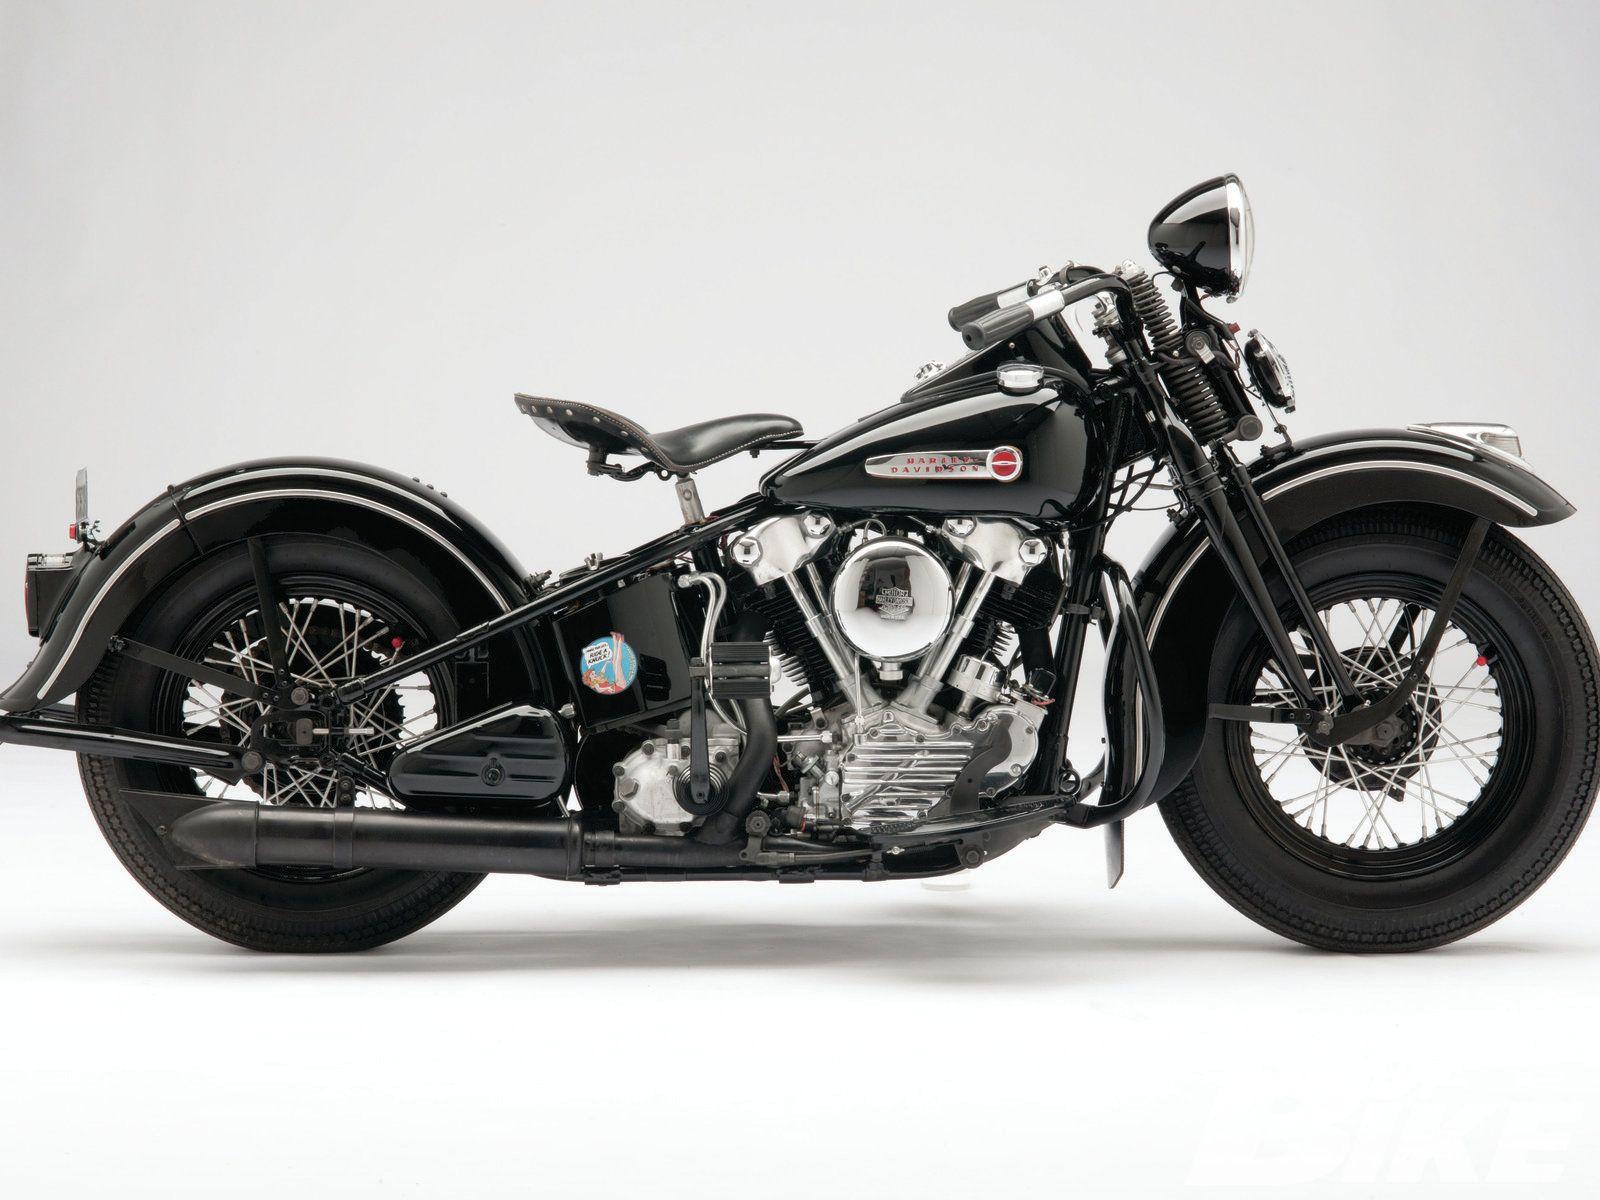 Harley Davidson: Harley Davidson Knuckleheads